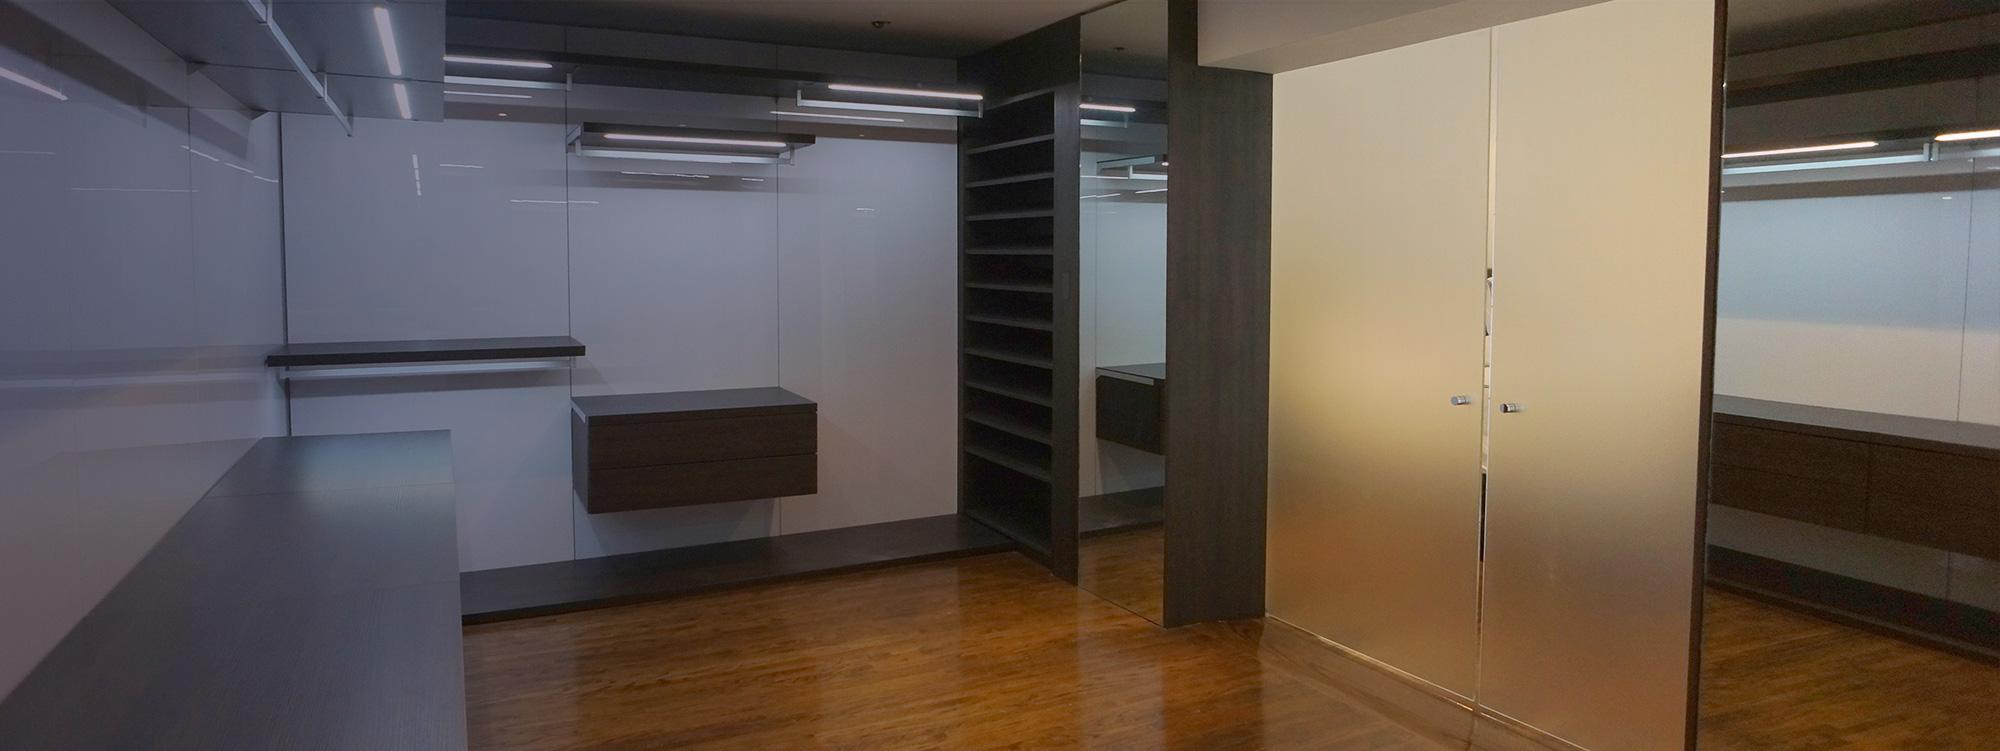 Custom Closet Storage Space in South Florida